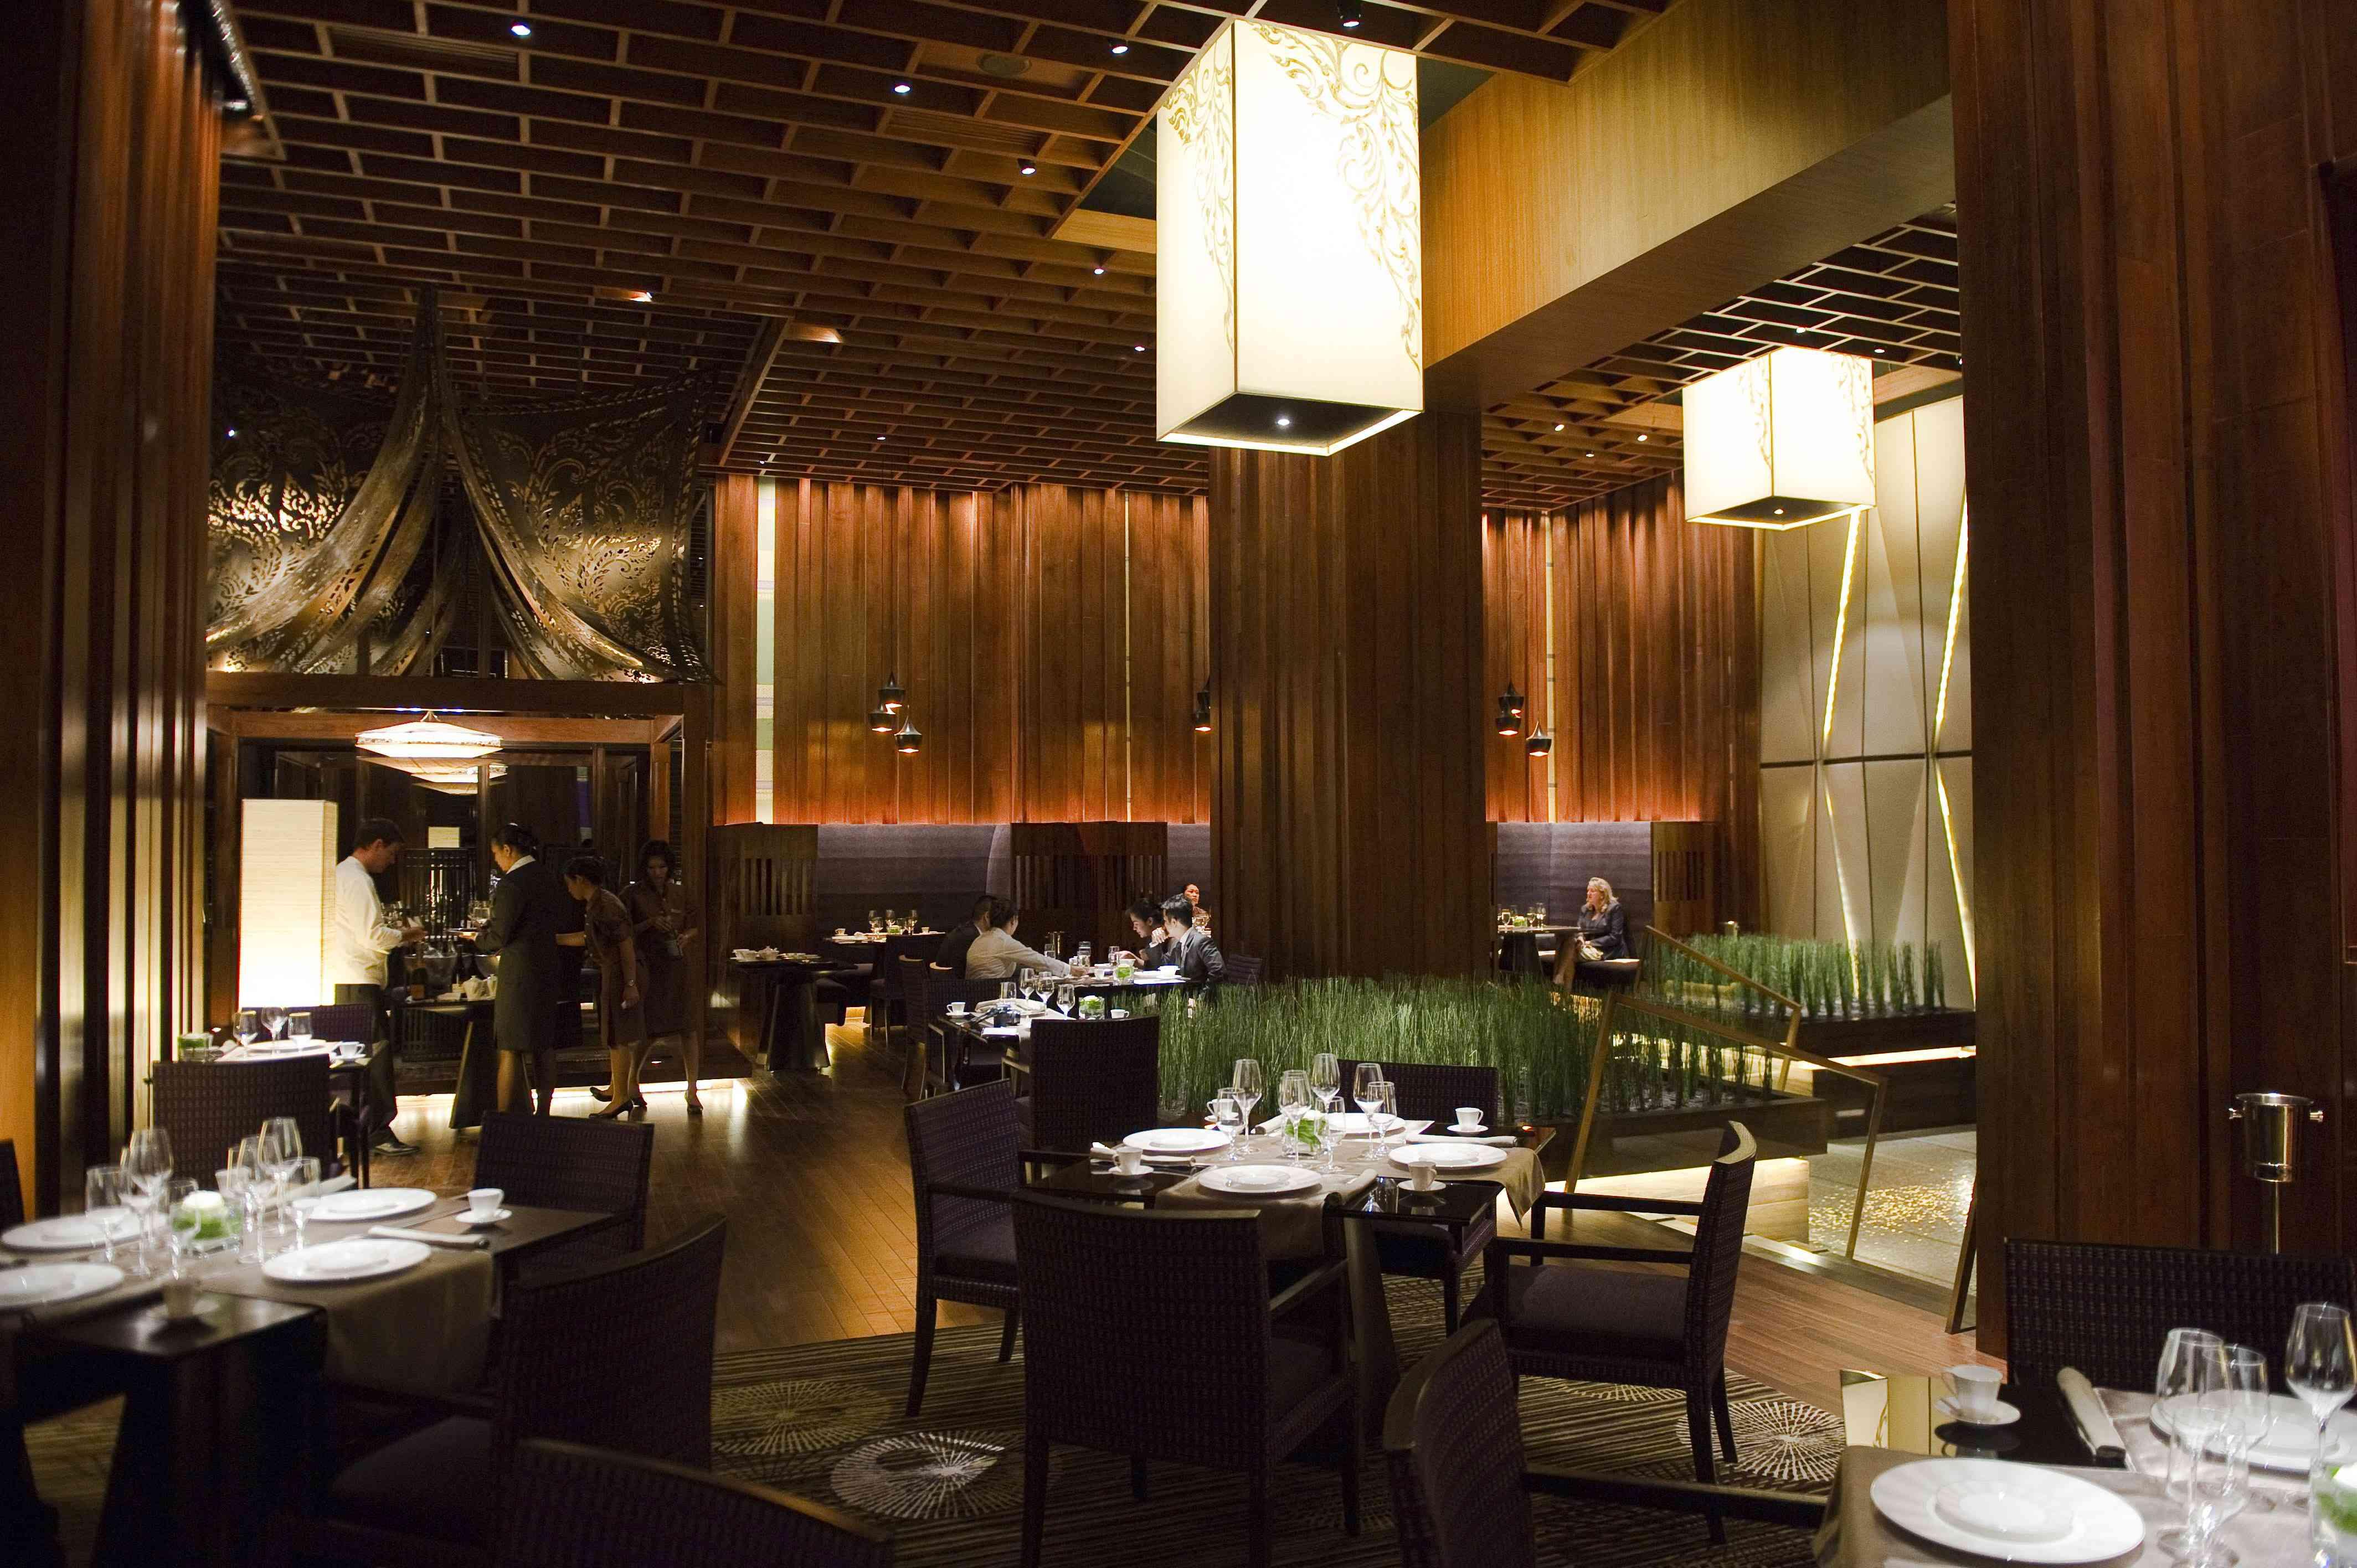 The inside of Sra Bua, a top restaurant in Bangkok